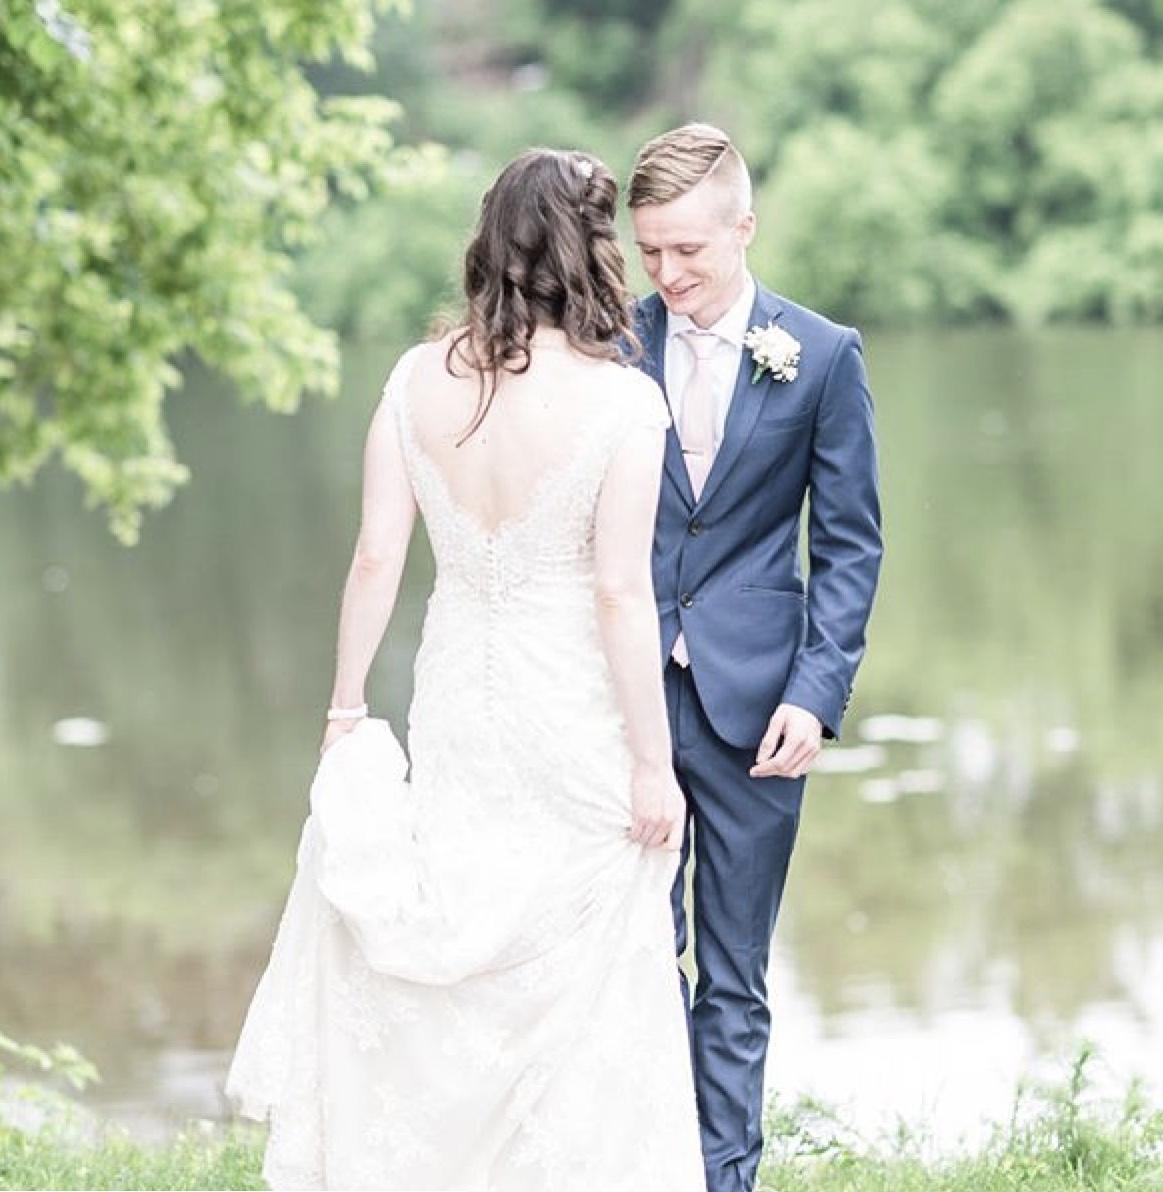 GENEVIEVE & DOUGLAS' WEDDING - ORCHARD VIEW MANOTICK